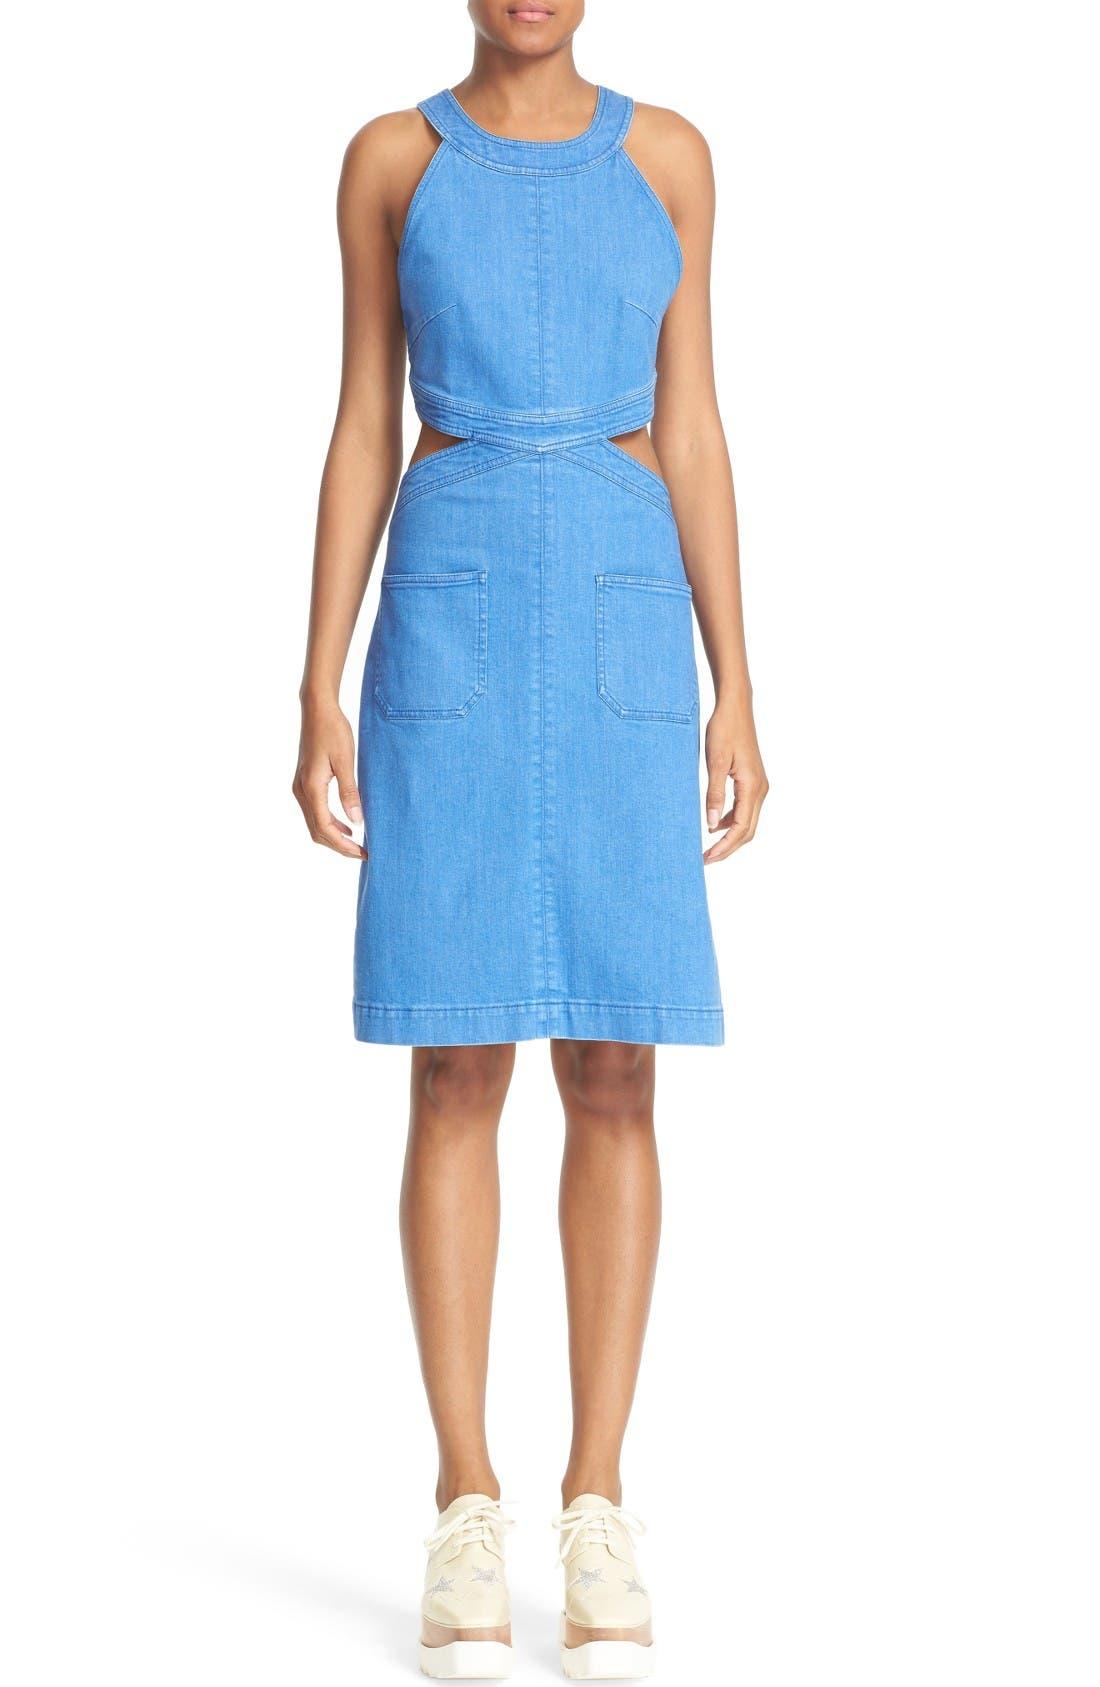 STELLA MCCARTNEY Stretch Denim Dress